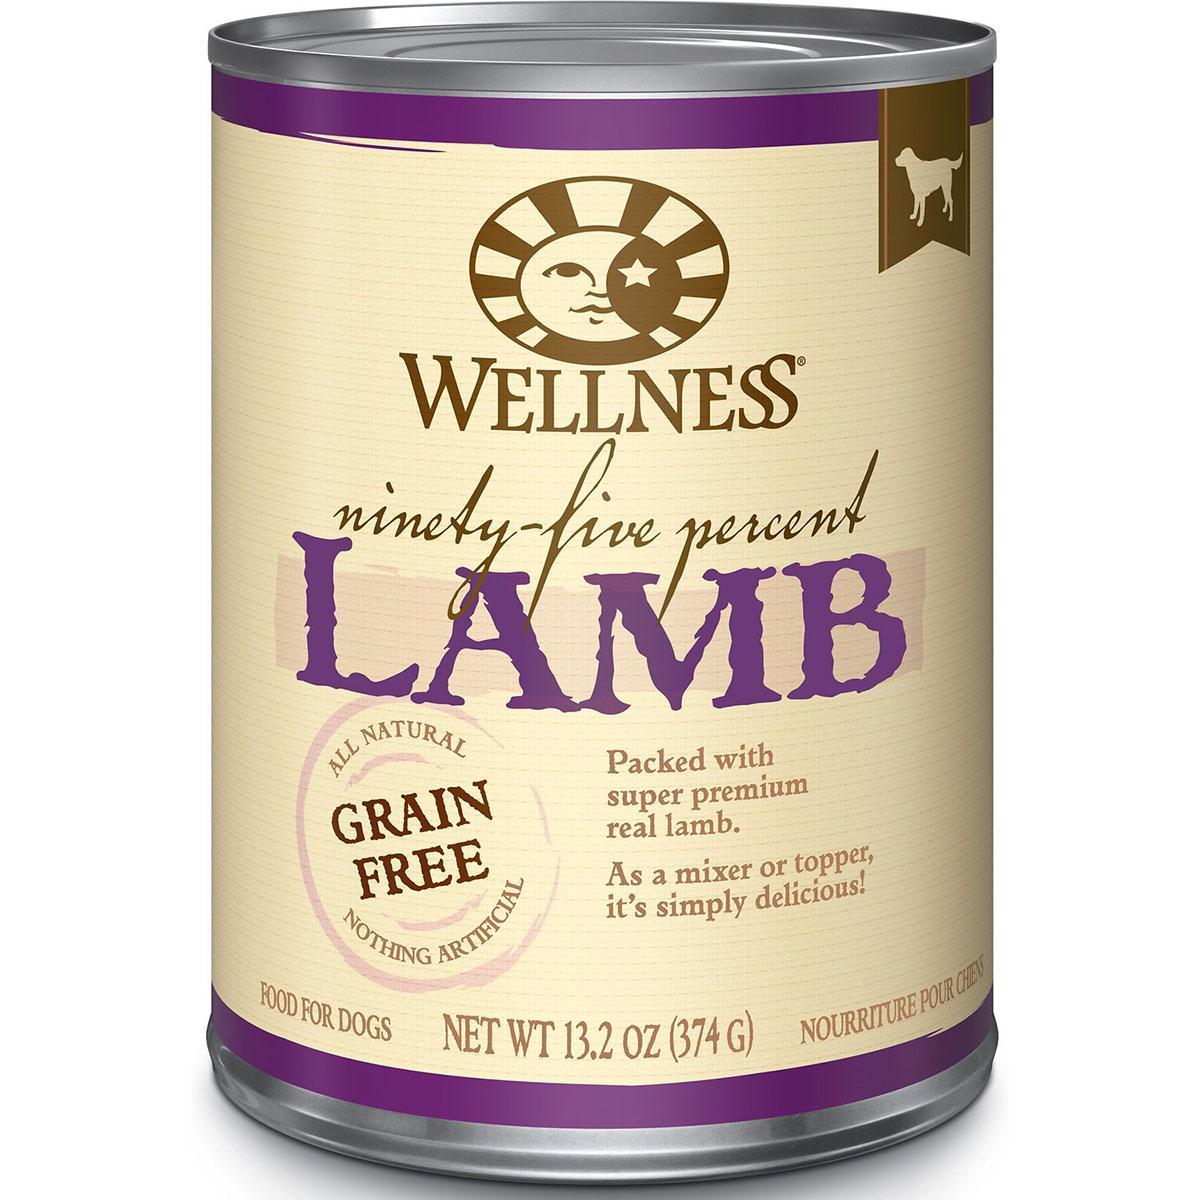 Wellness Ninety-Five Percent Lamb Grain-Free Canned Dog Food